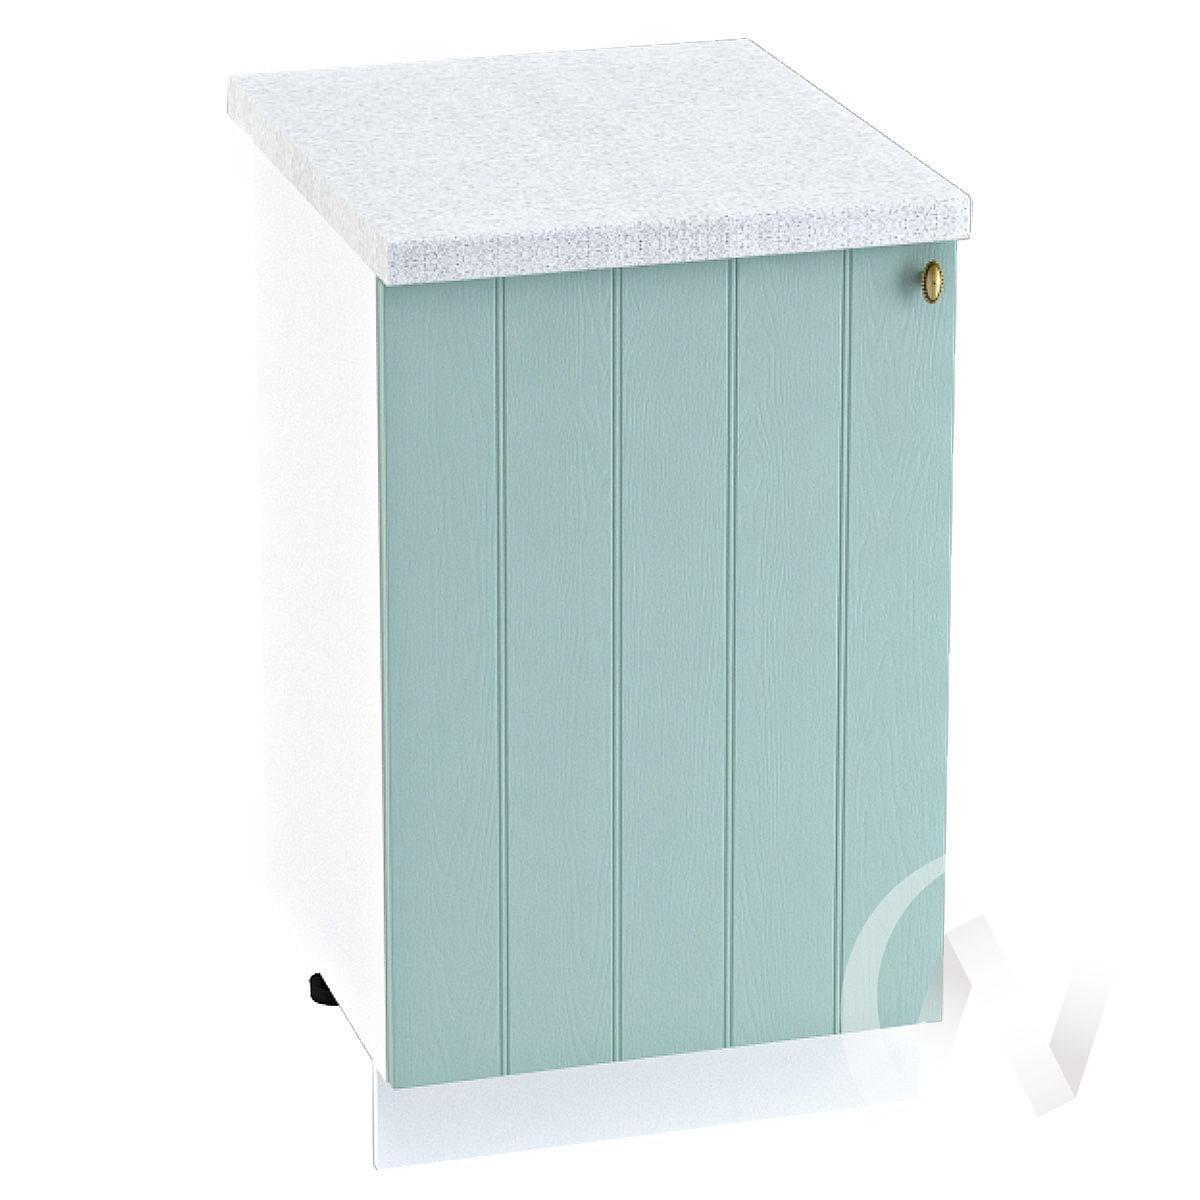 "Кухня ""Прованс"": Шкаф нижний 500, ШН 500 (голубой/корпус белый)"